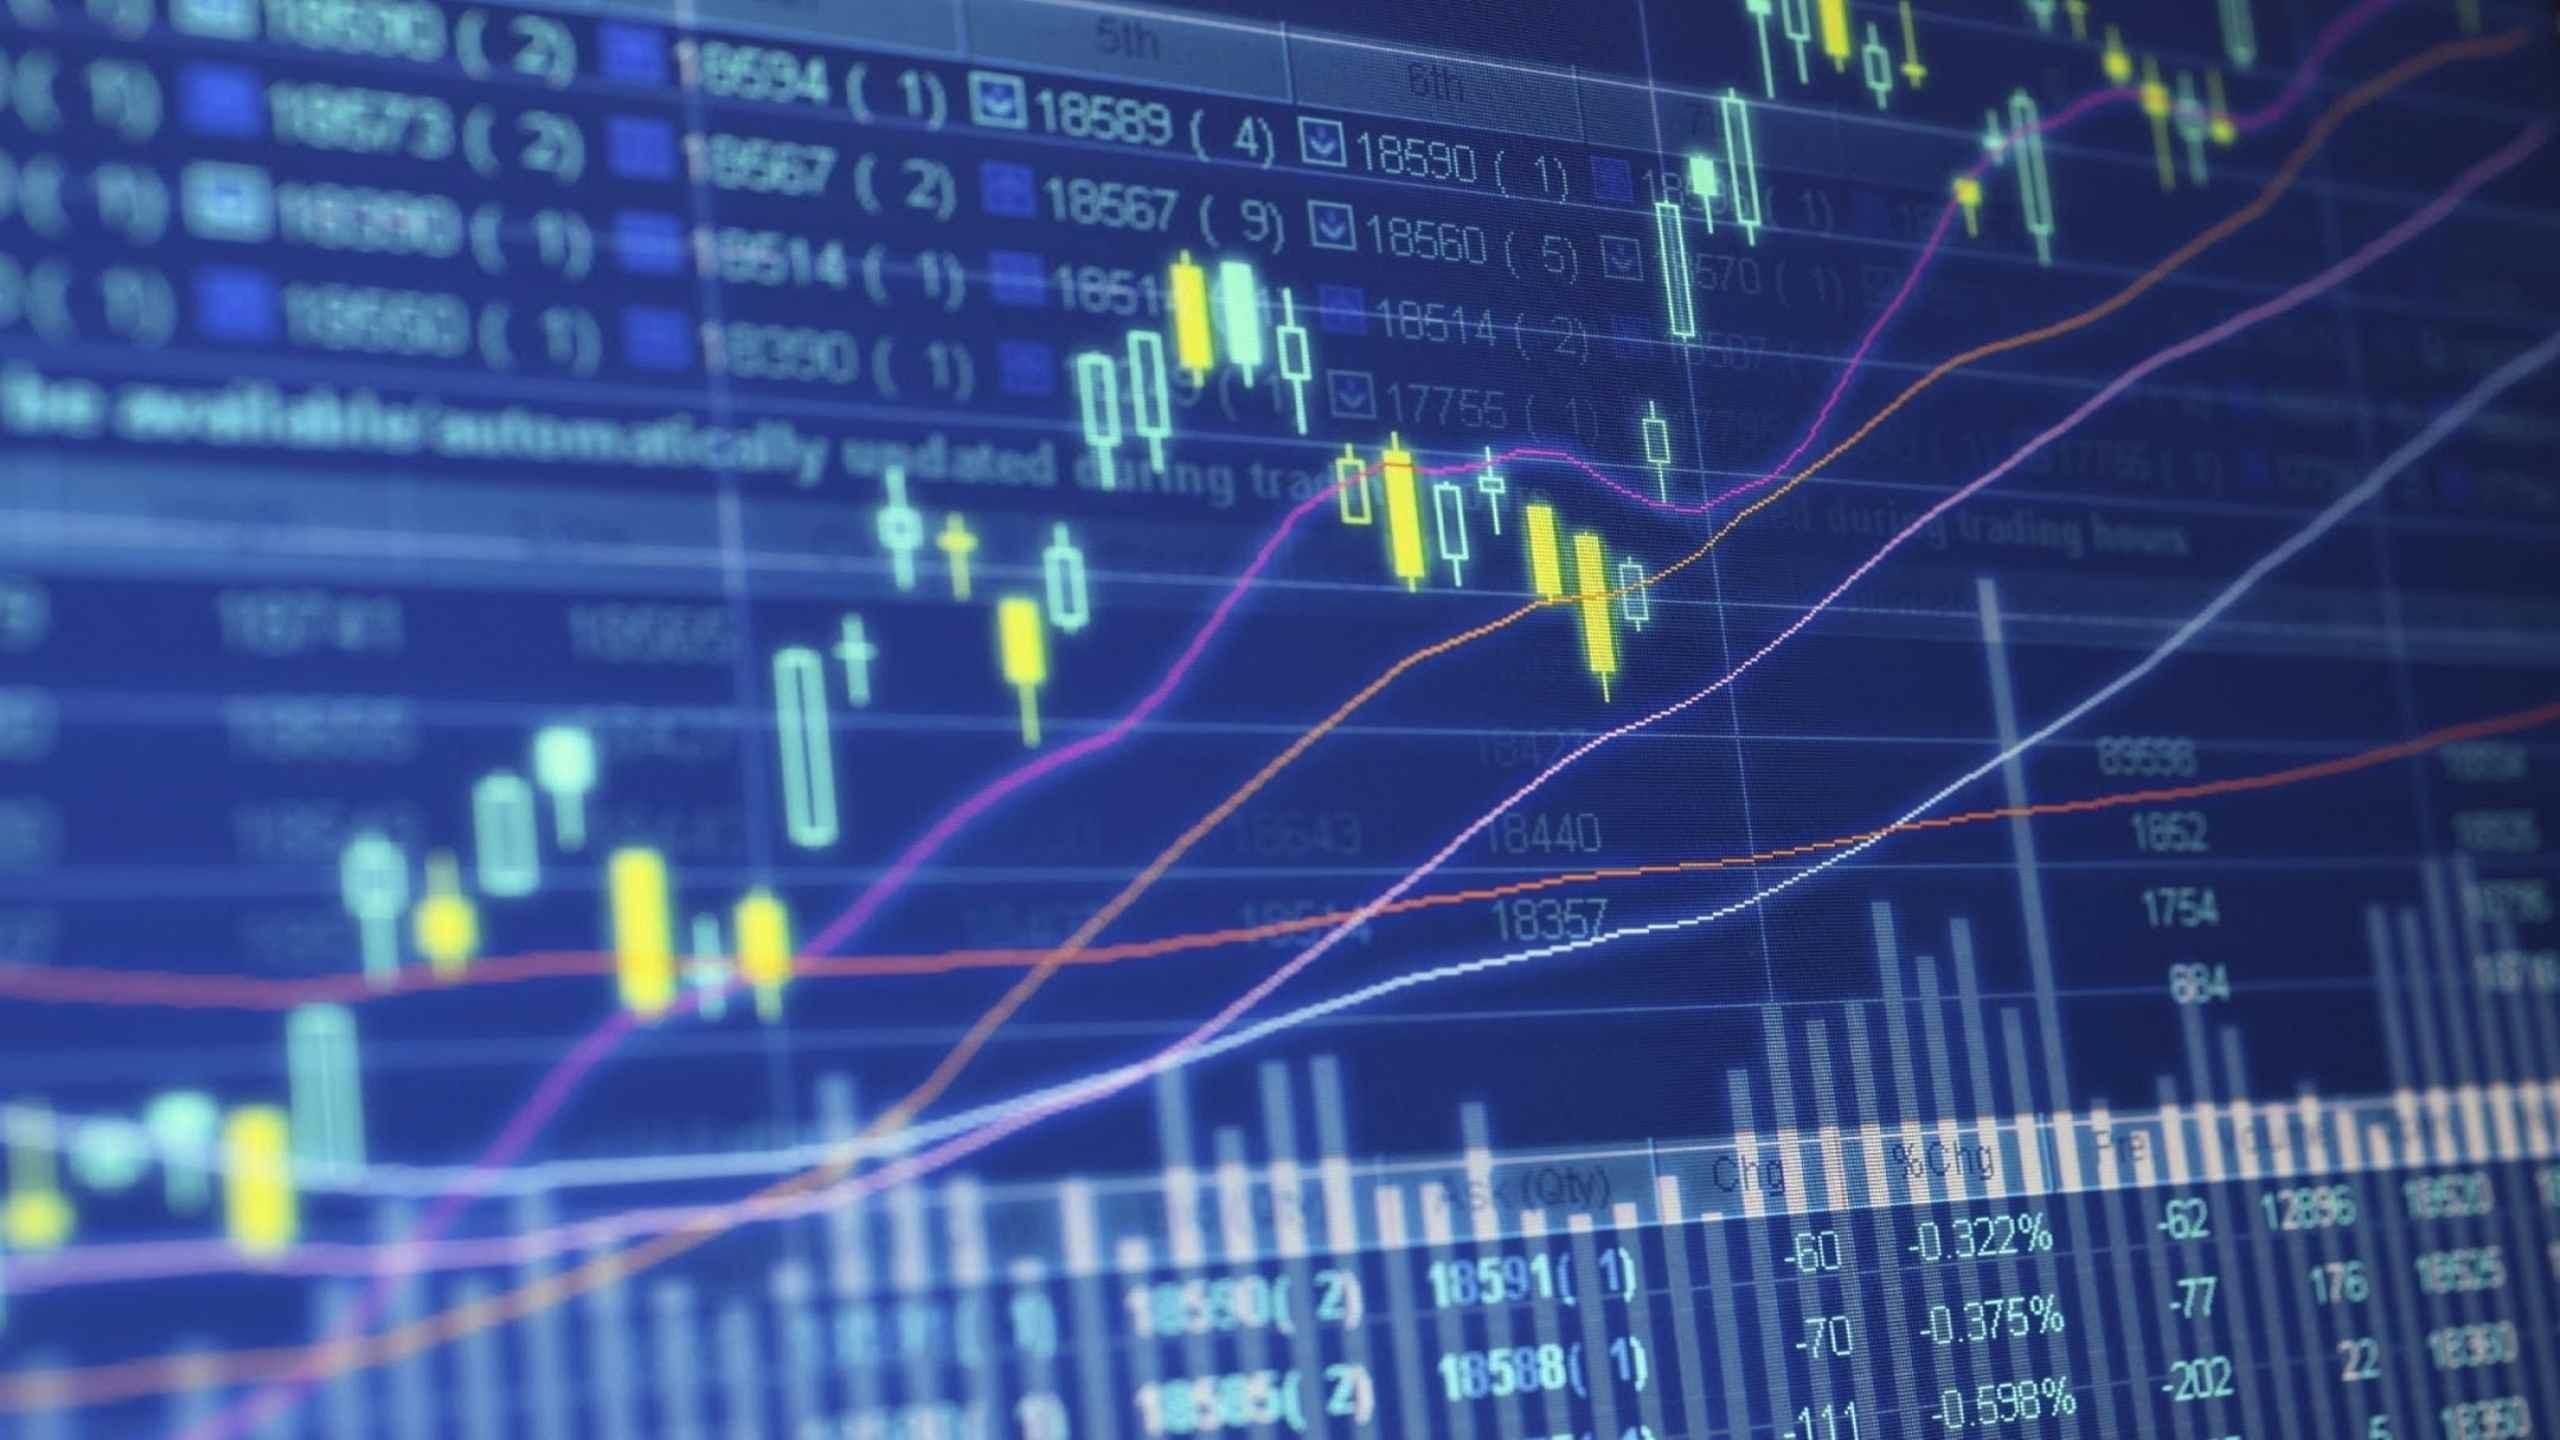 Symphonie trading signals 1.9